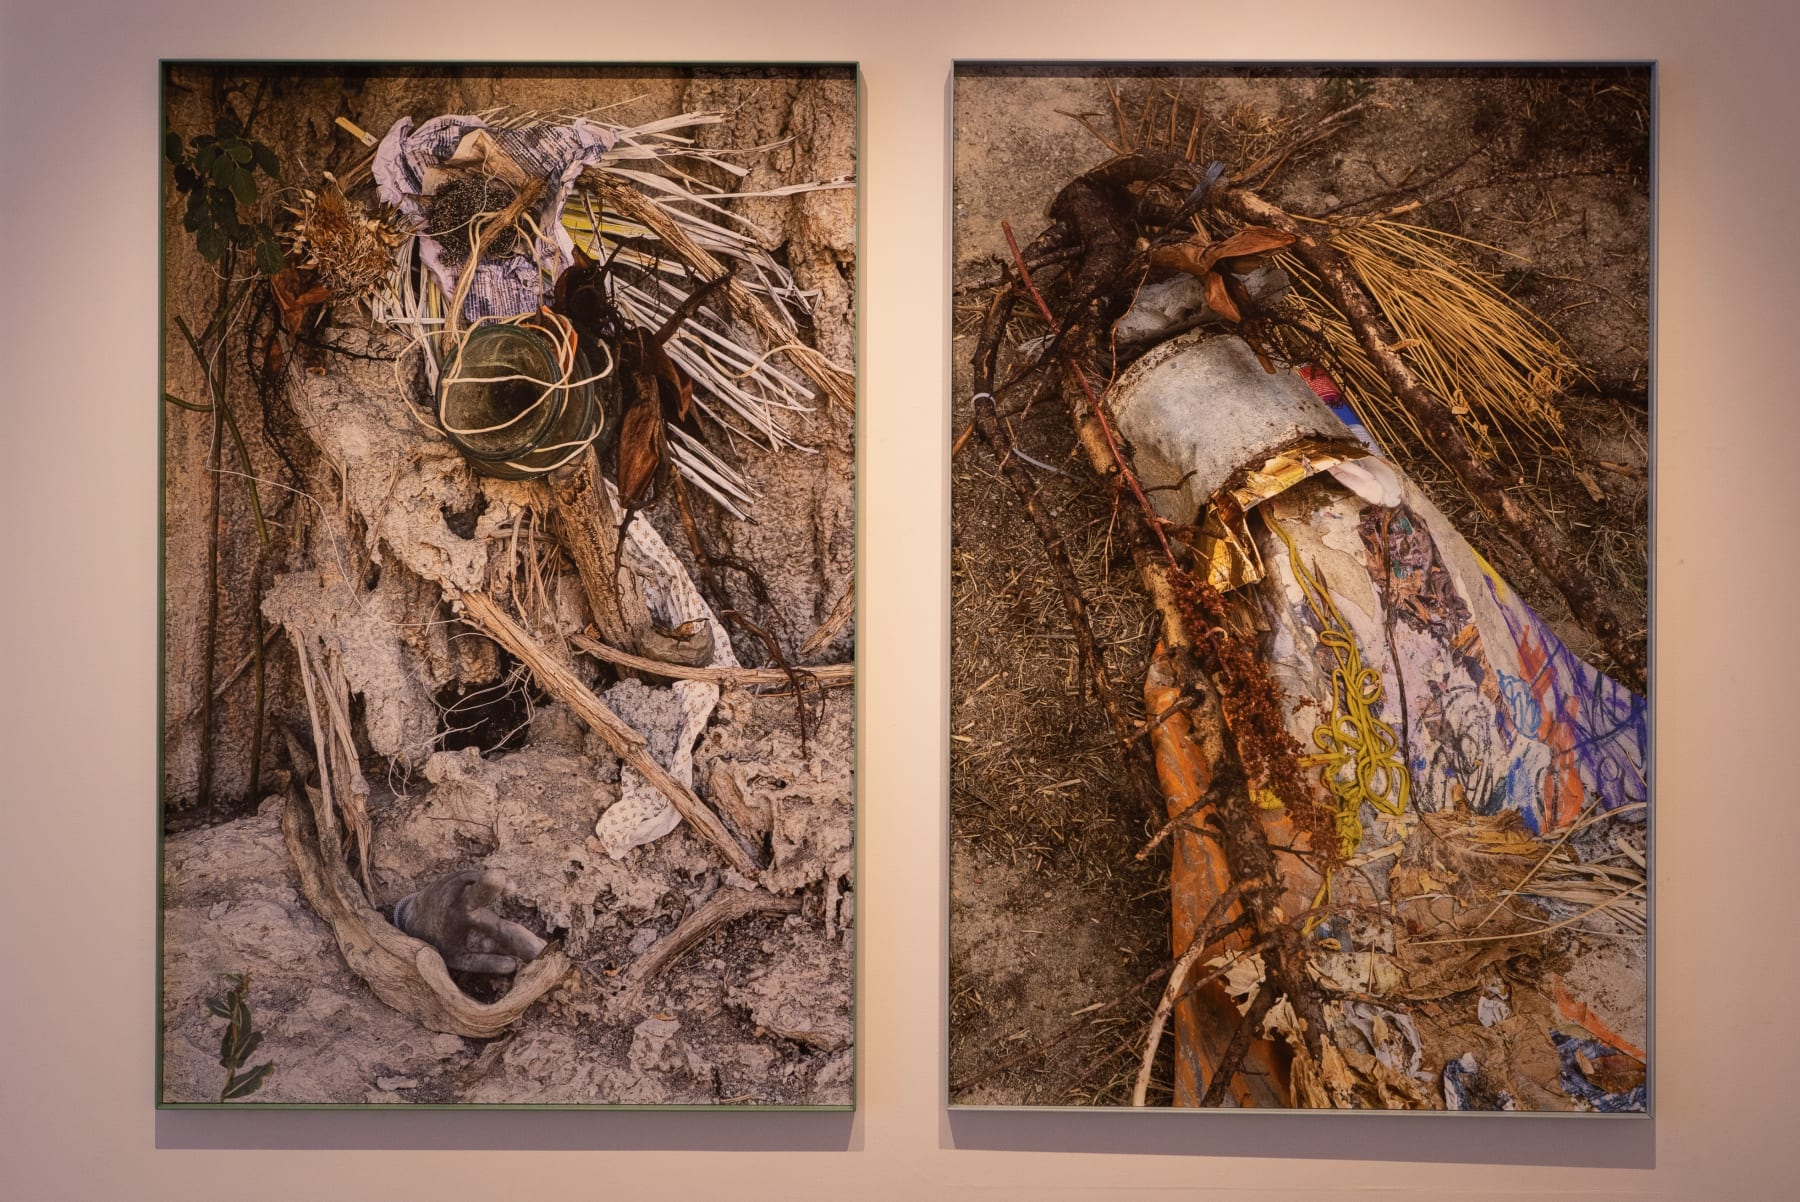 Robertas Narkus, installation view Photographed by Laurynas Skeisgiela